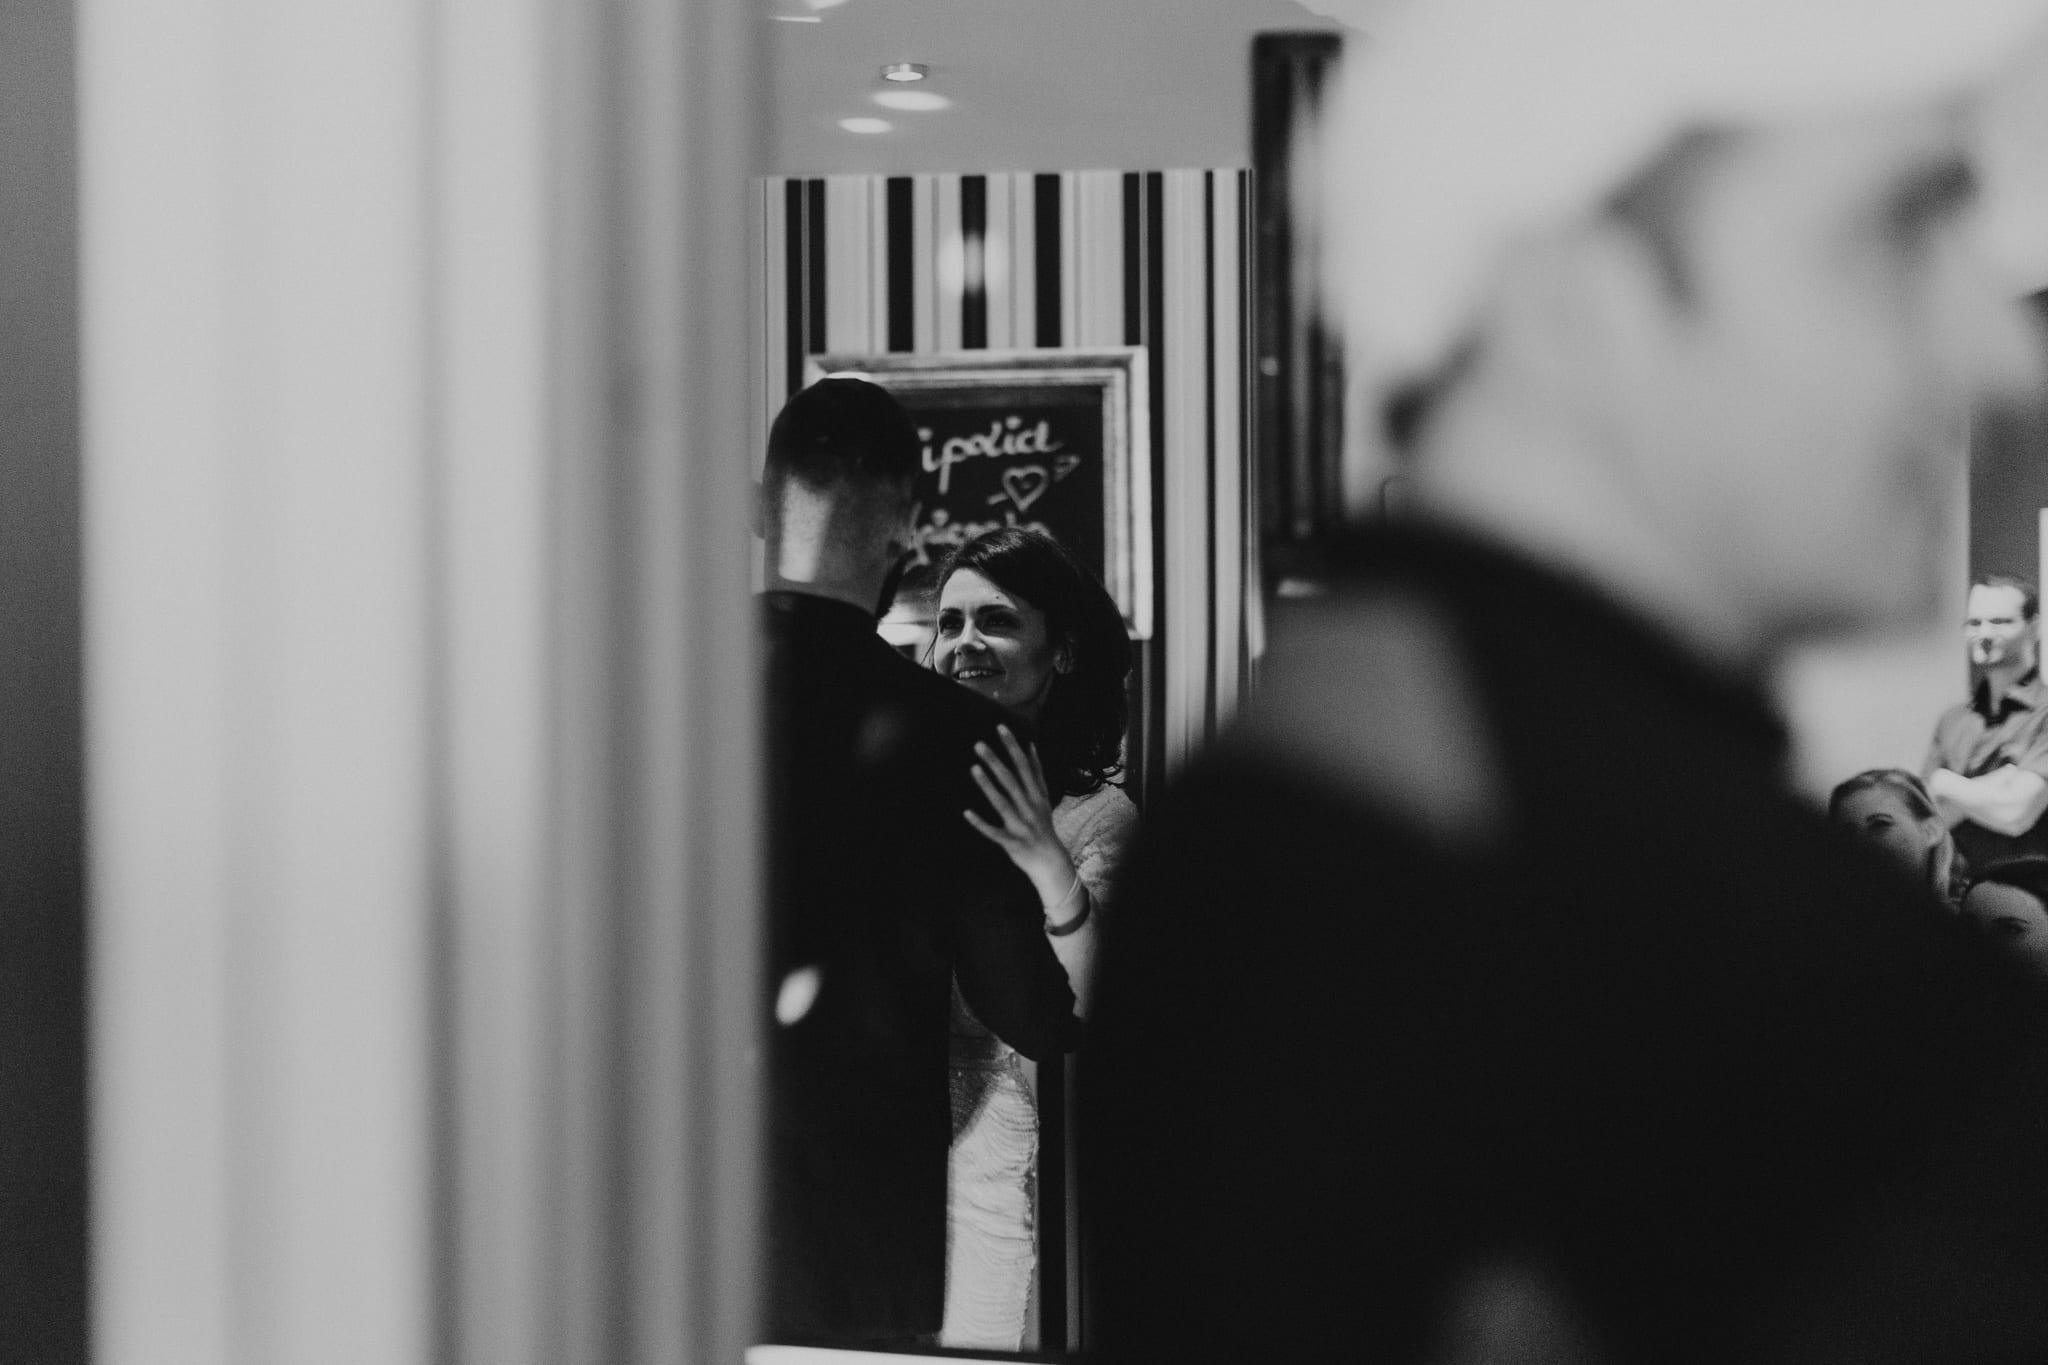 wesele w bawarii rothenburg agahipo 99